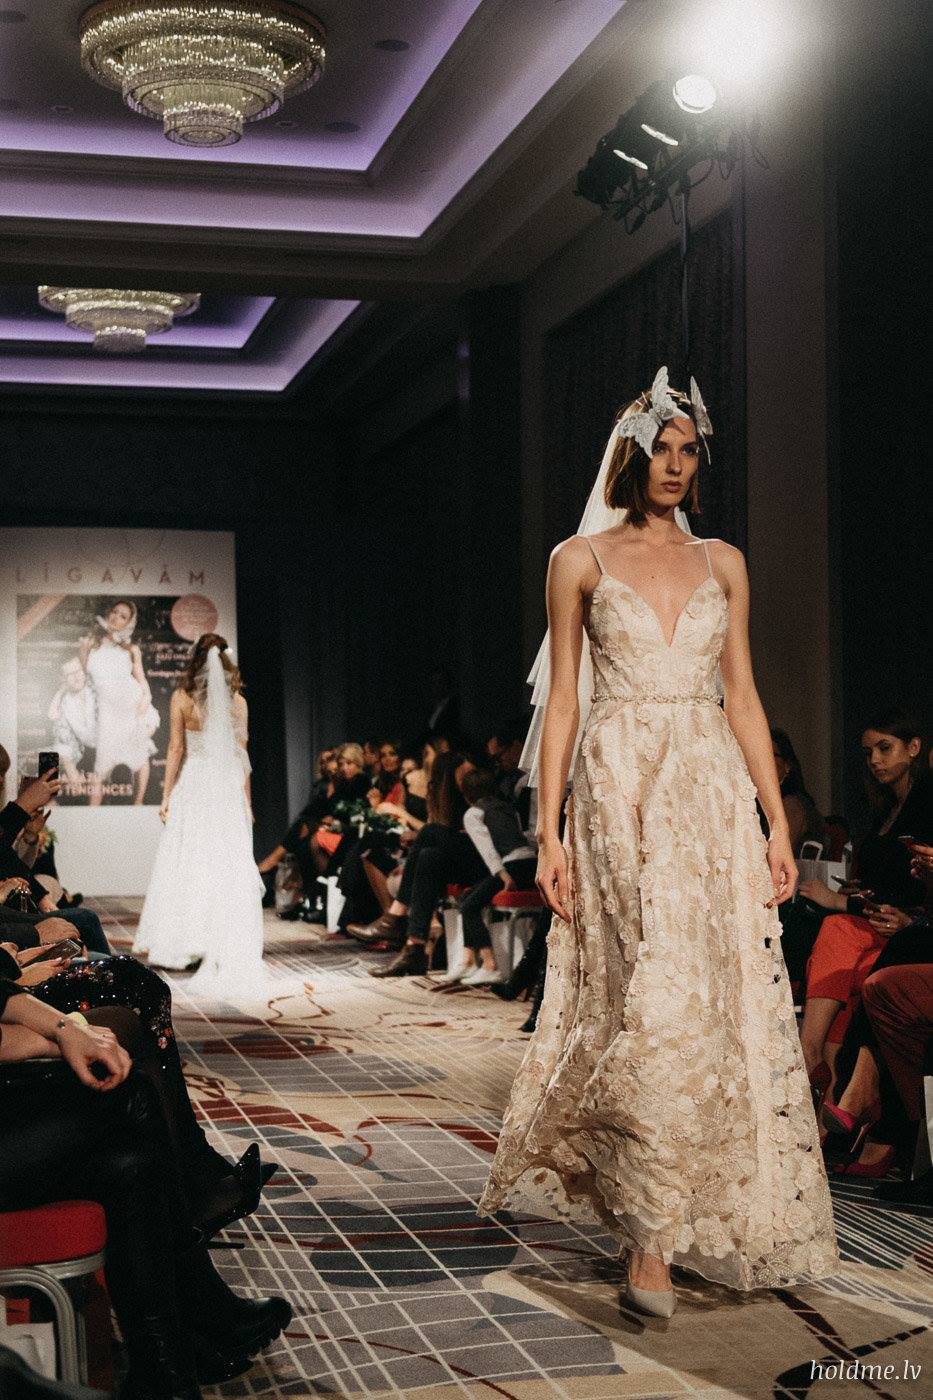 Amelia-wedding-dresses-146